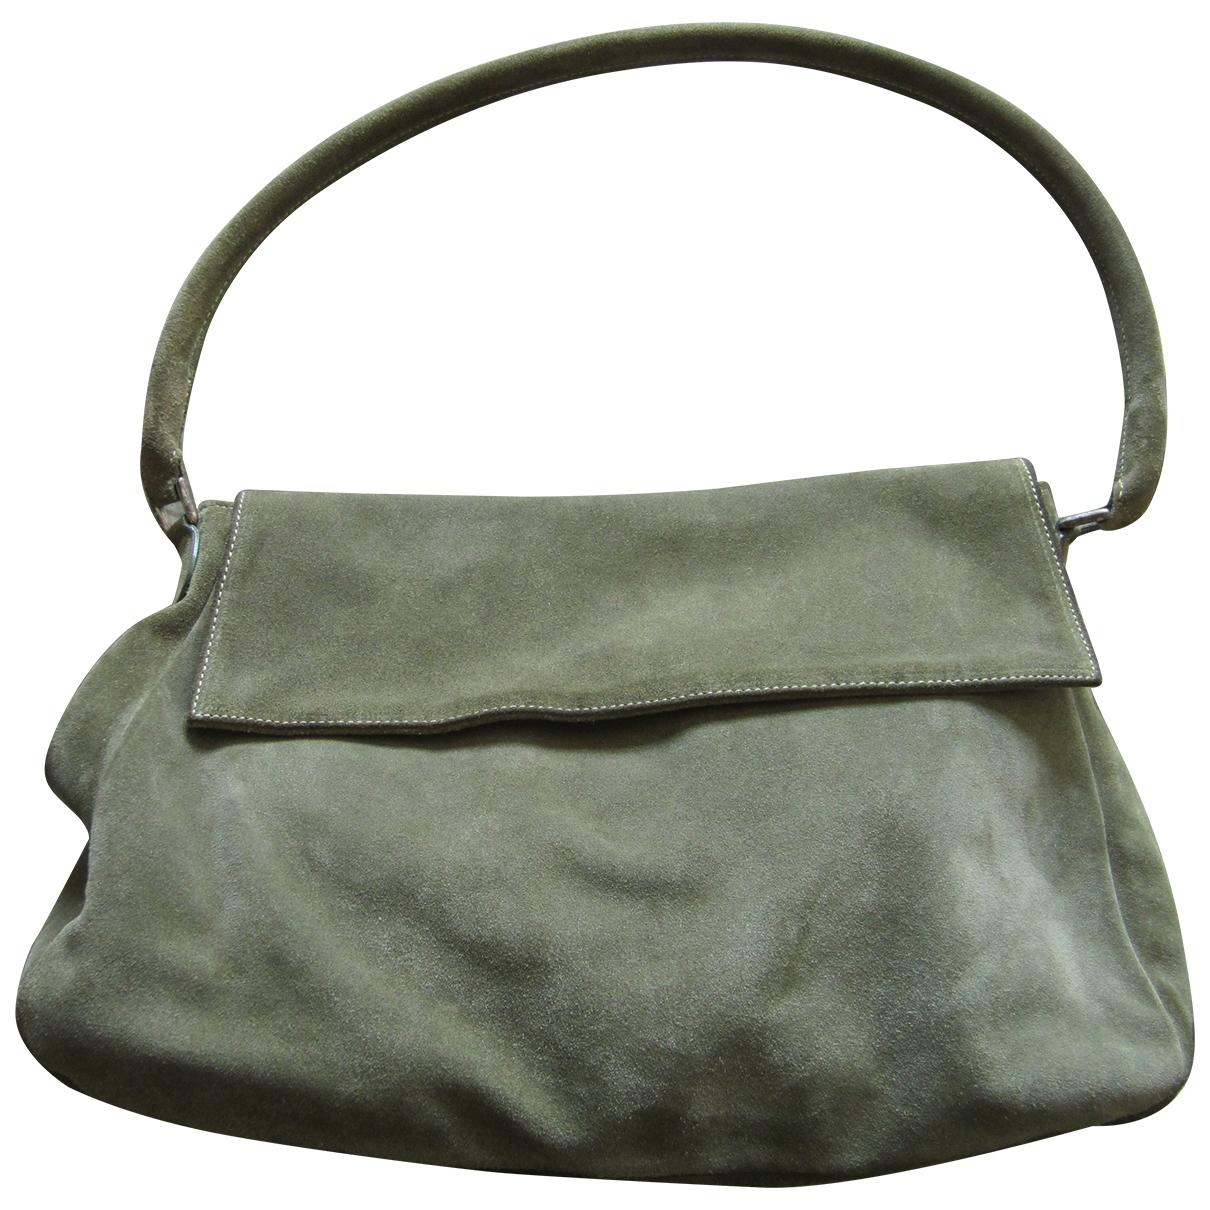 Marella \N Green Suede handbag for Women \N